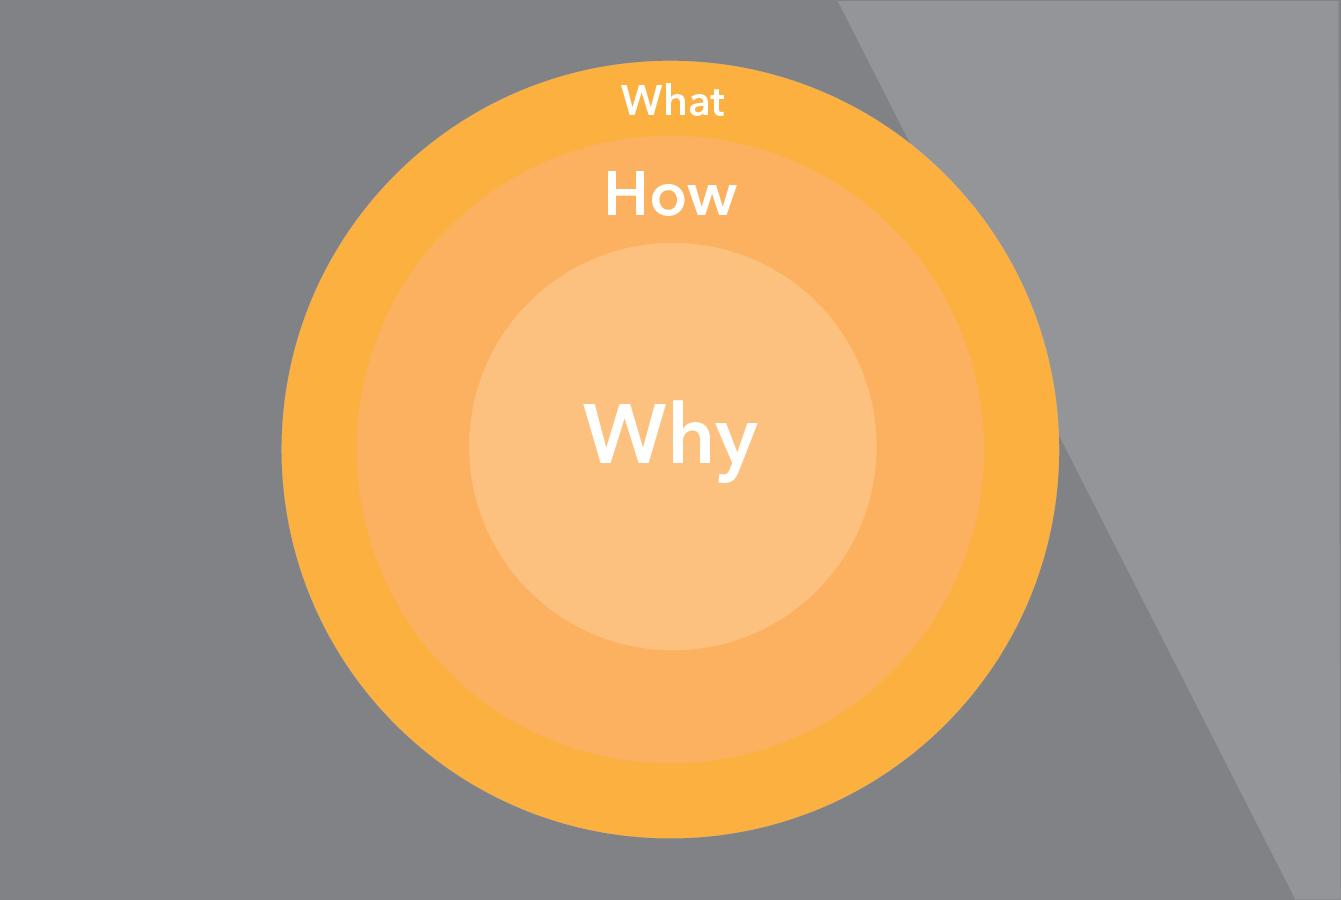 pet-business-marketing-guide-pet-product-marketing-plan-golden-circle